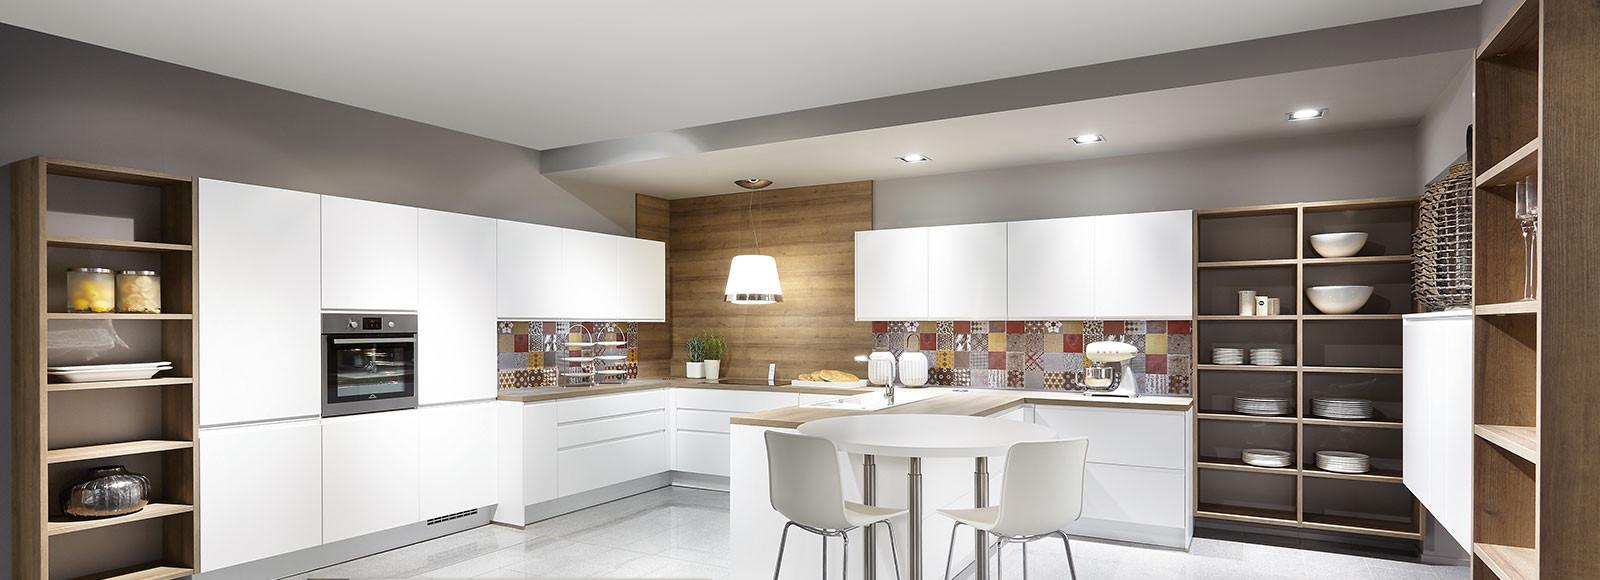 Cocinas zaragoza astilo cocinas - Dibujos de cocinas ...